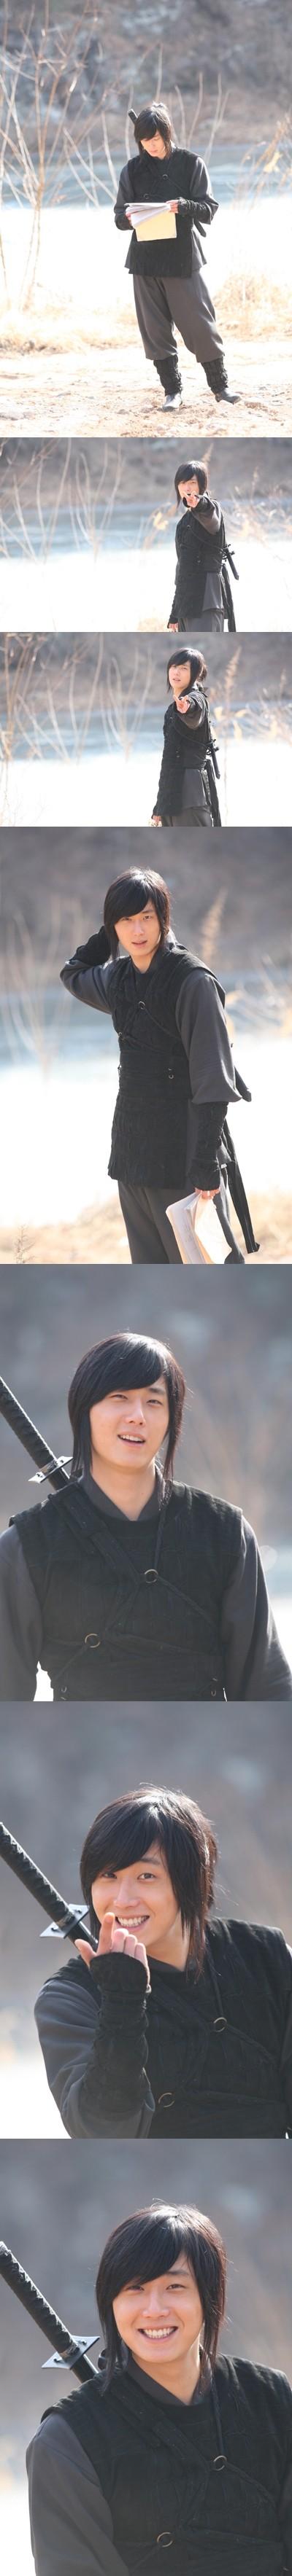 2009 Return Iljimae Cast & BTS 7